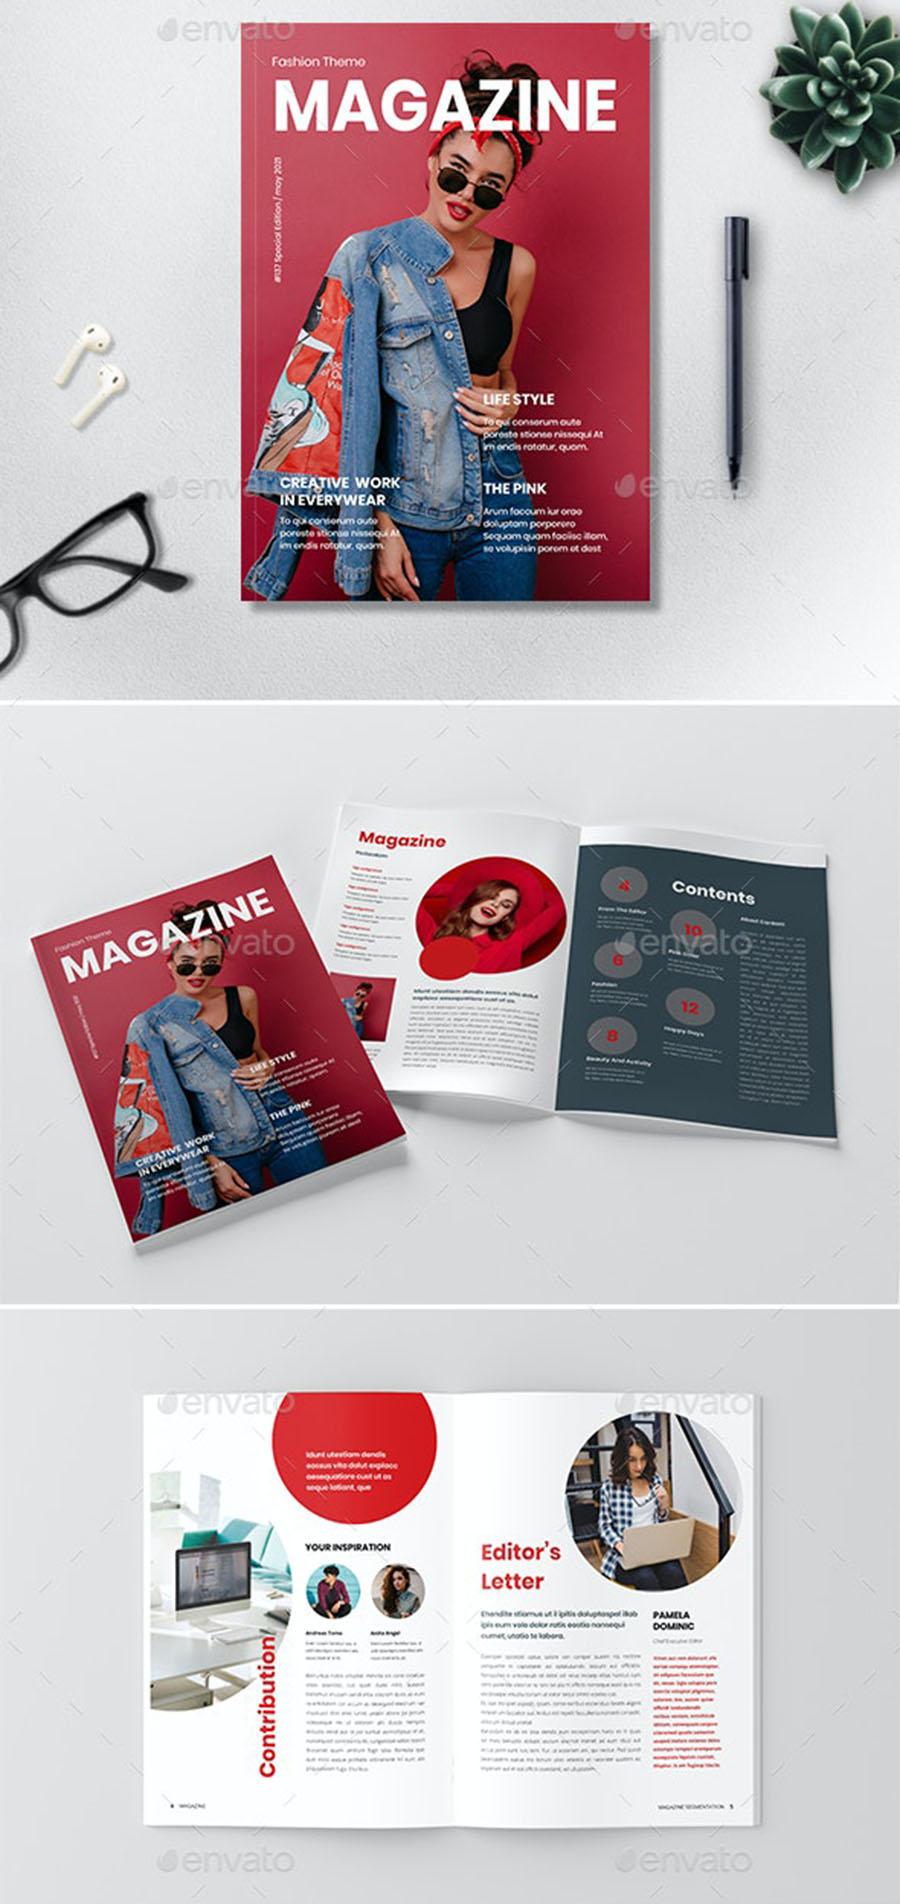 Fashion Theme InDesign Magazine Template